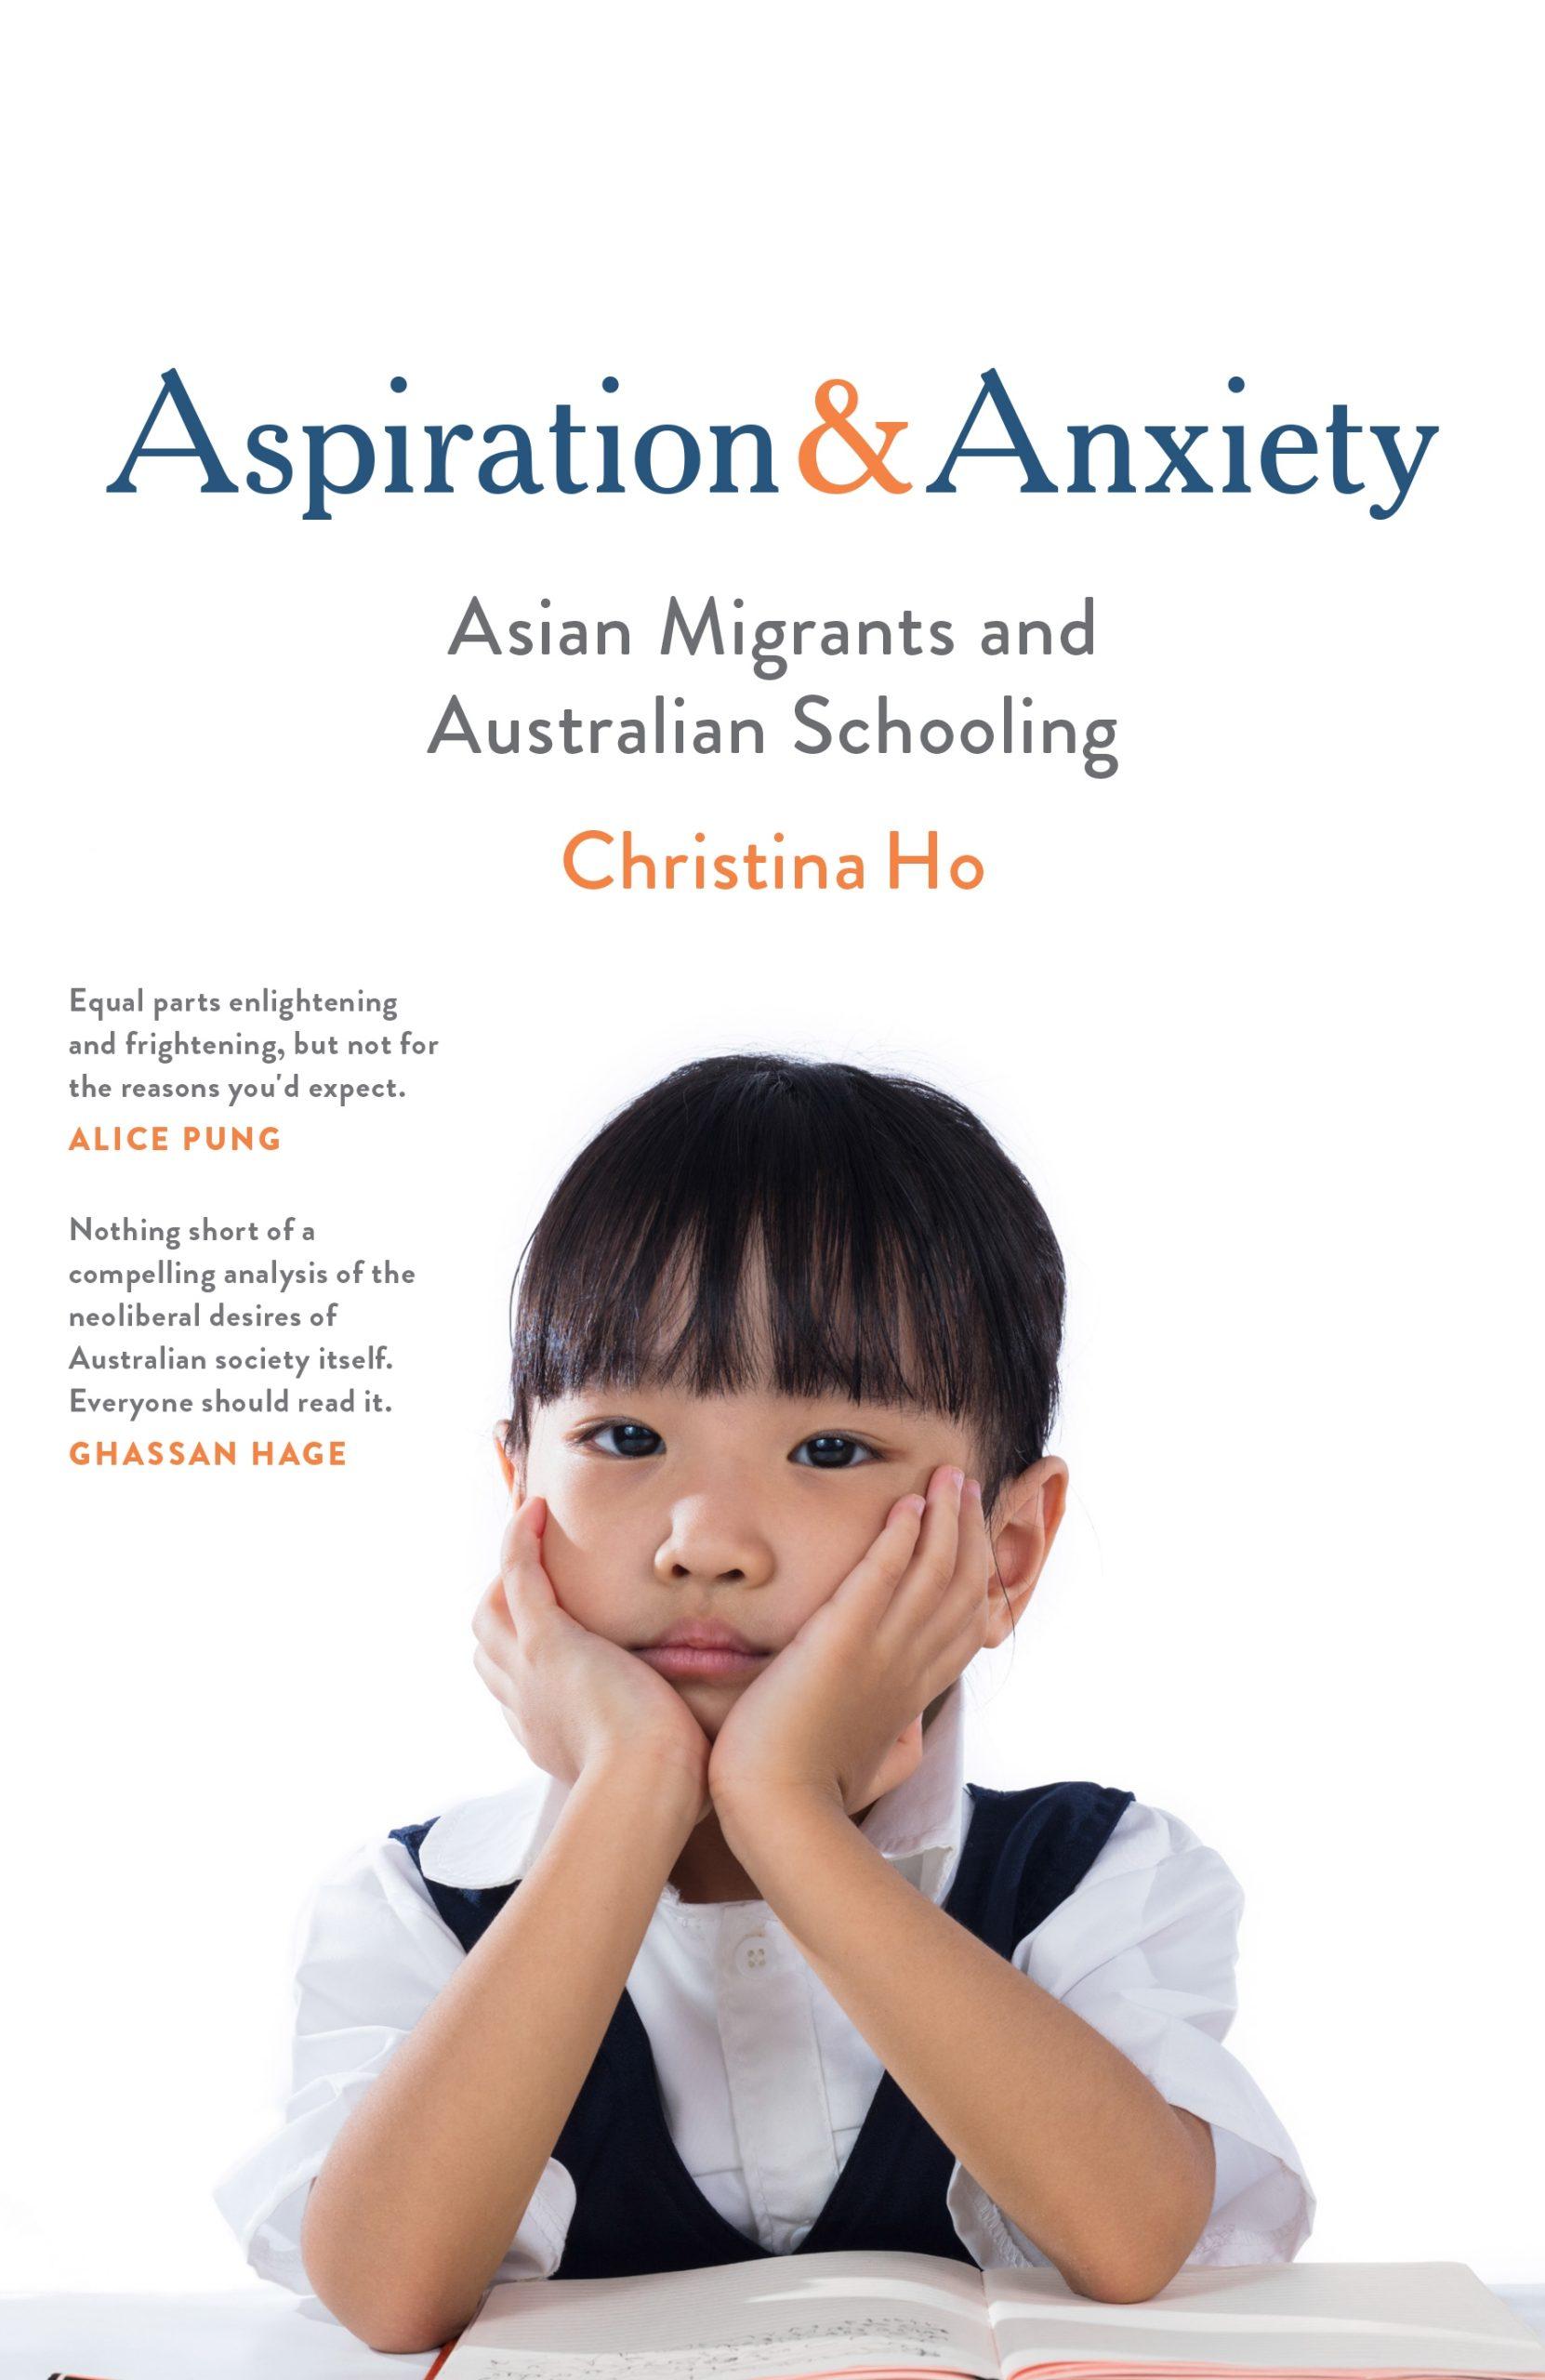 Aspiration & Anxiety